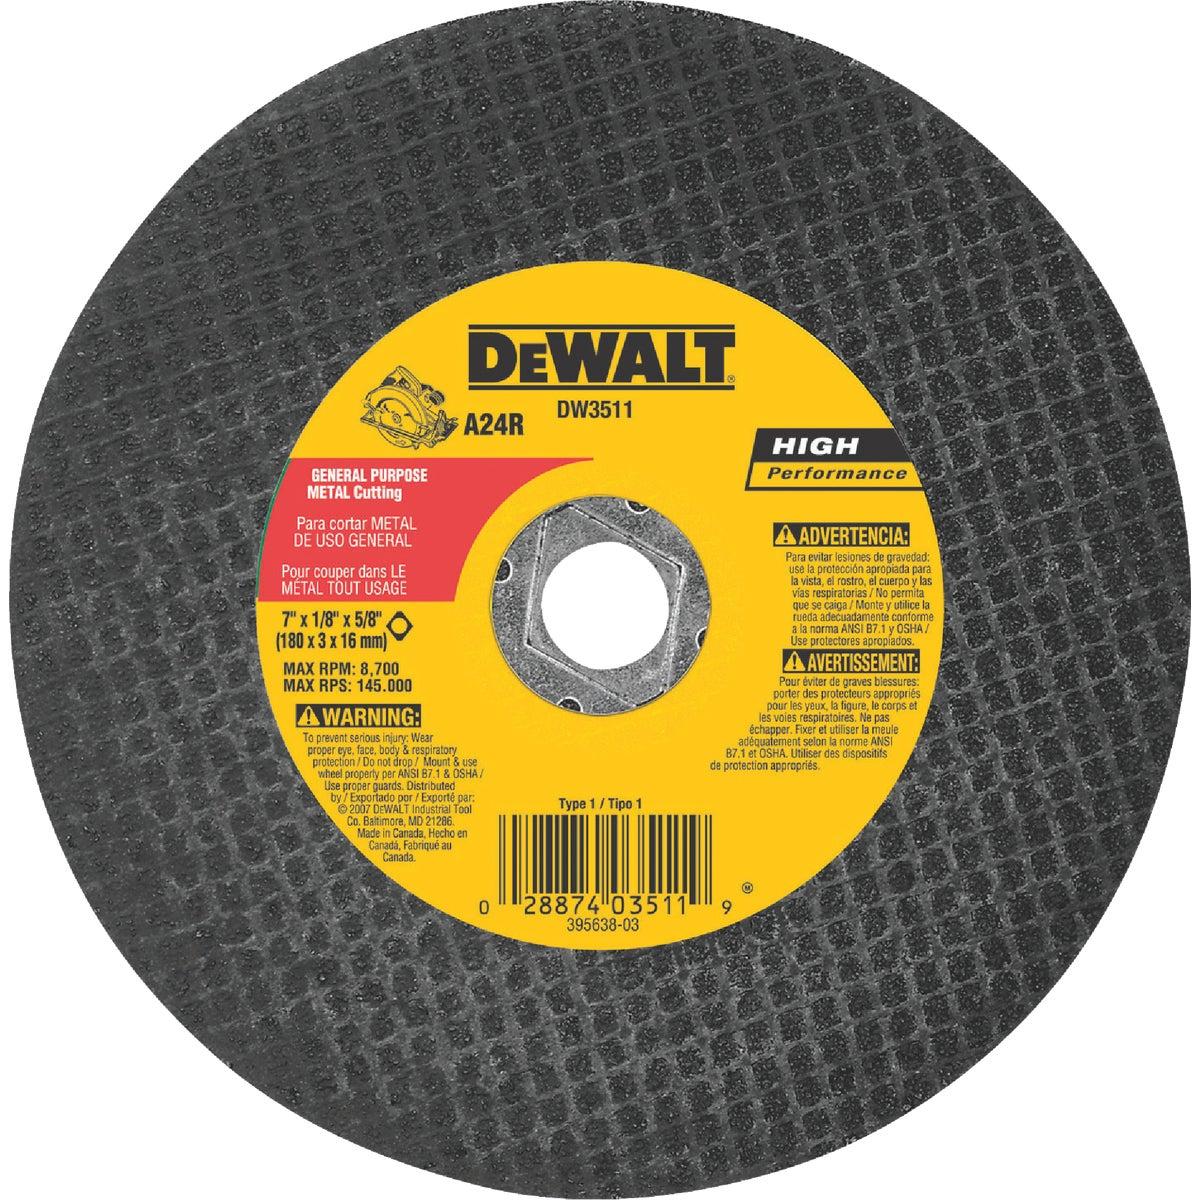 "7"" METAL ABRASIVE BLADE - DW3511 by DeWalt"